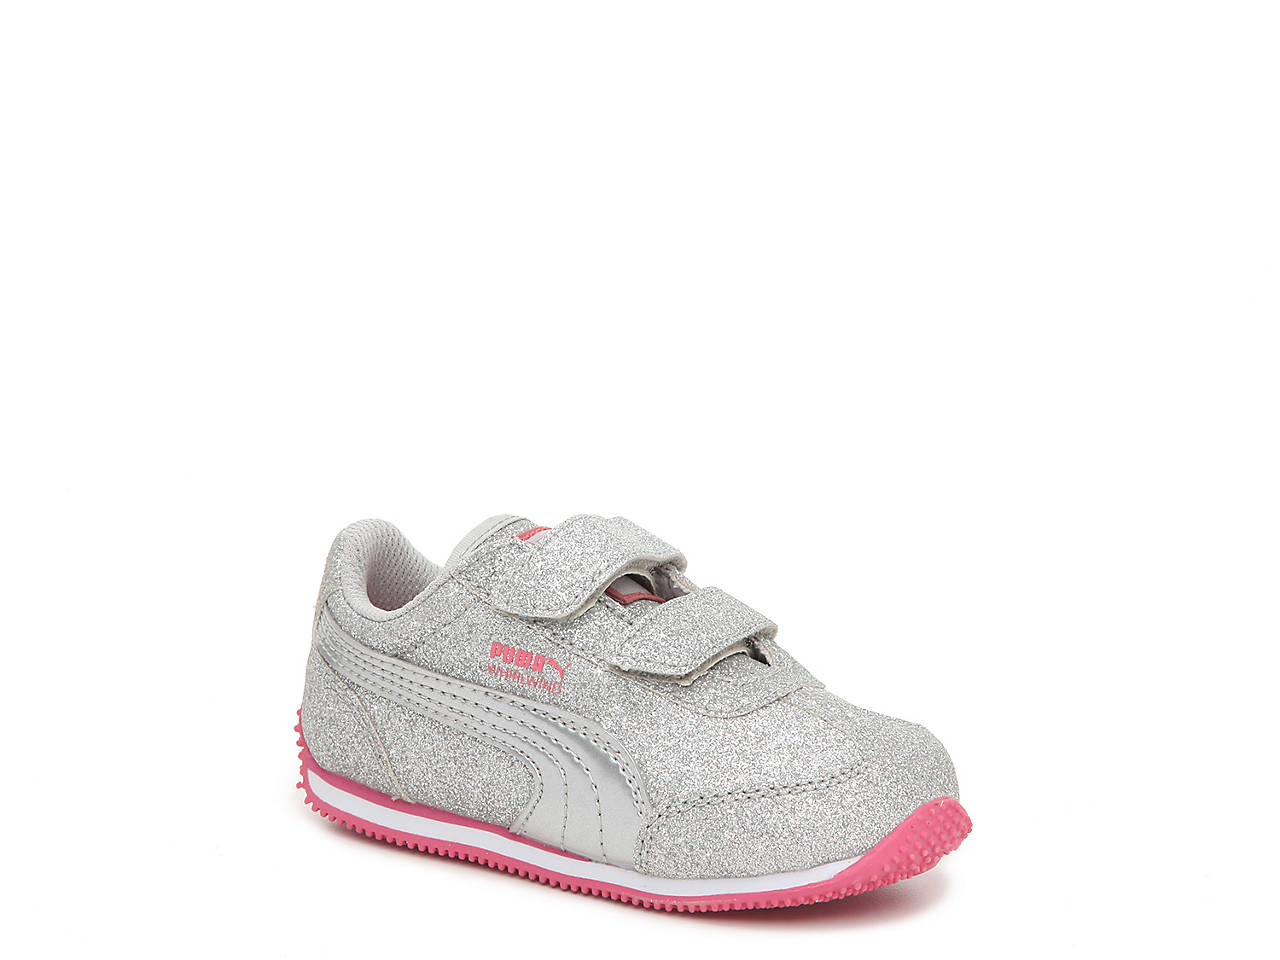 0050d69cdd30 Puma Whirlwind Glitz Infant   Toddler Sneaker Kids Shoes